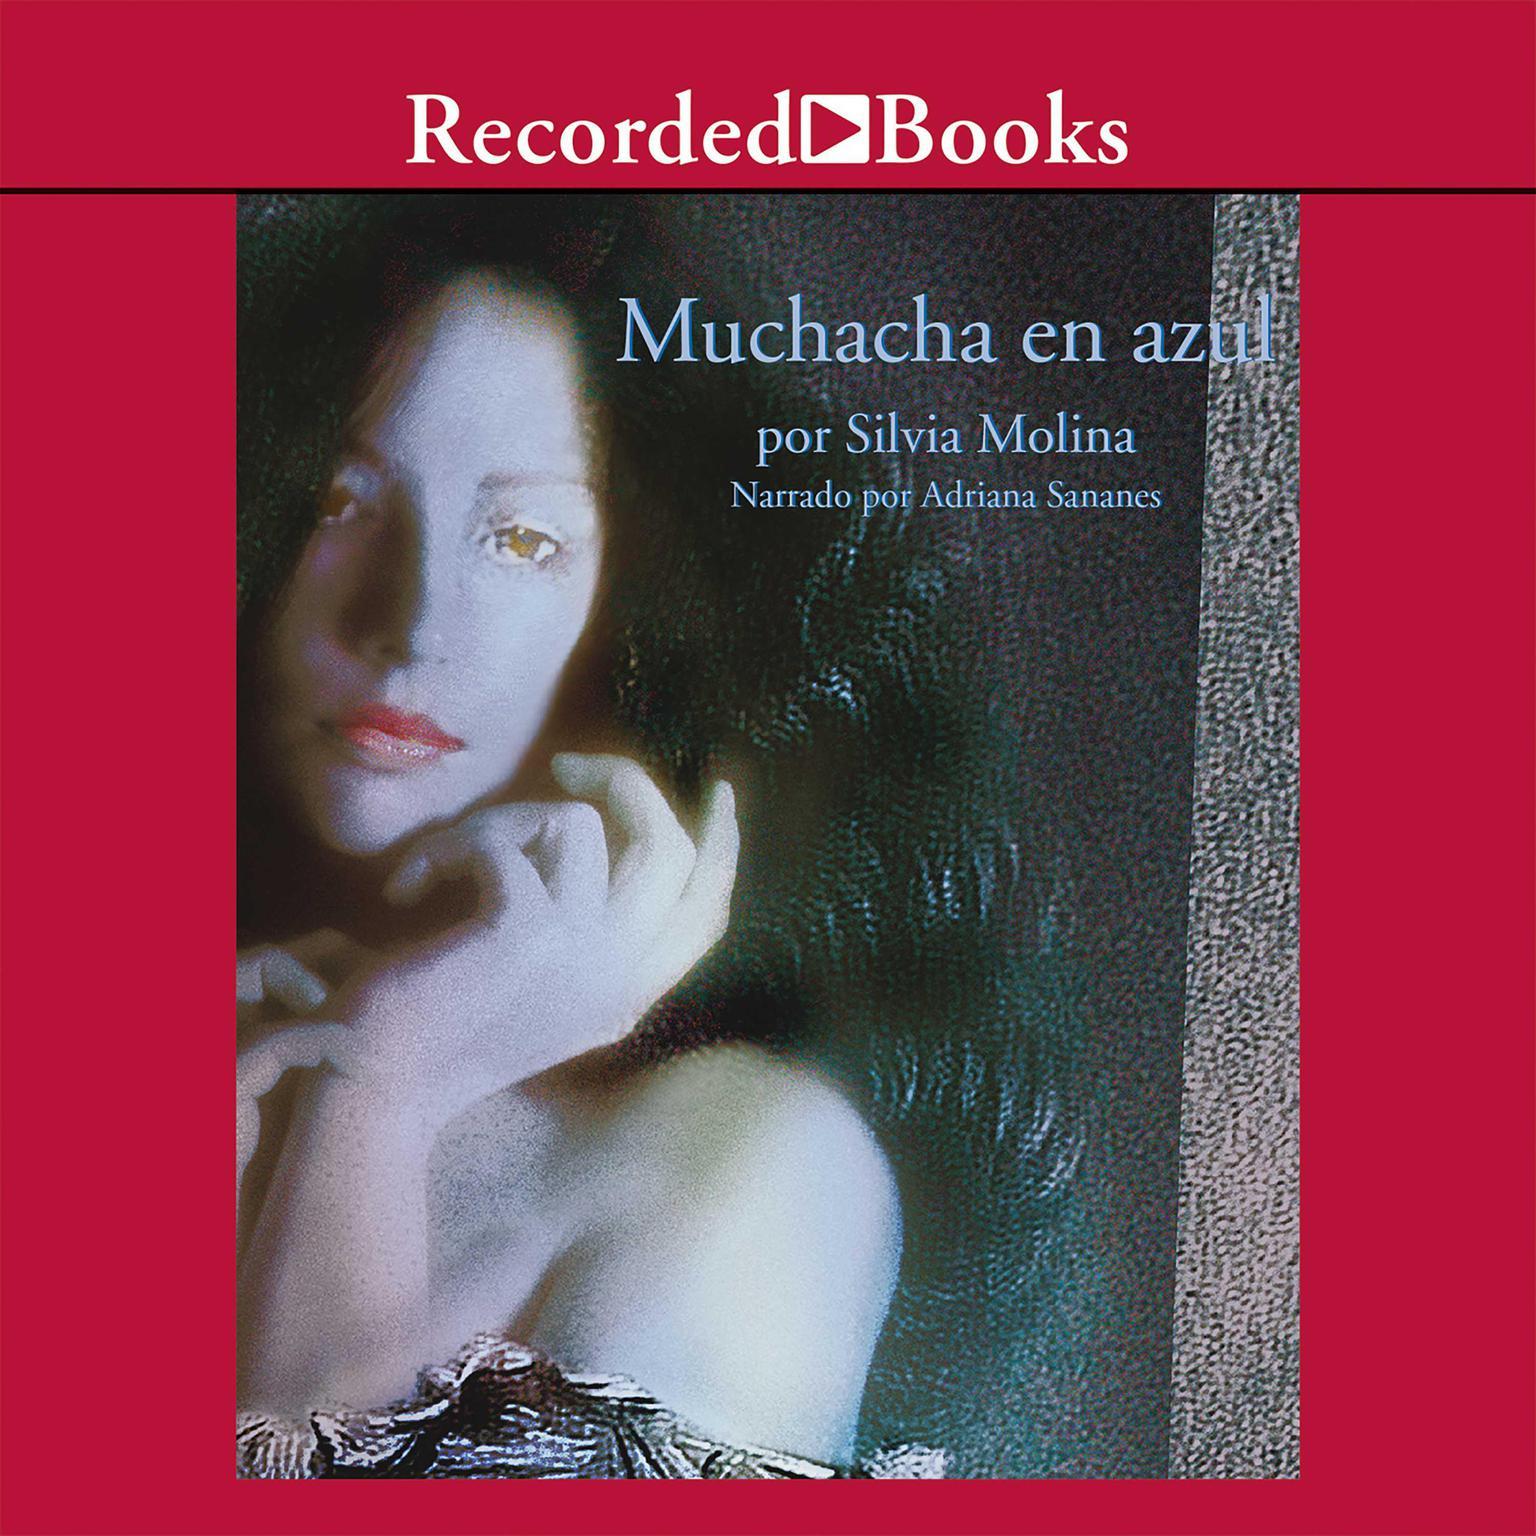 Muchacha en Azul (Girl in Blue) Audiobook, by Silvia Molina